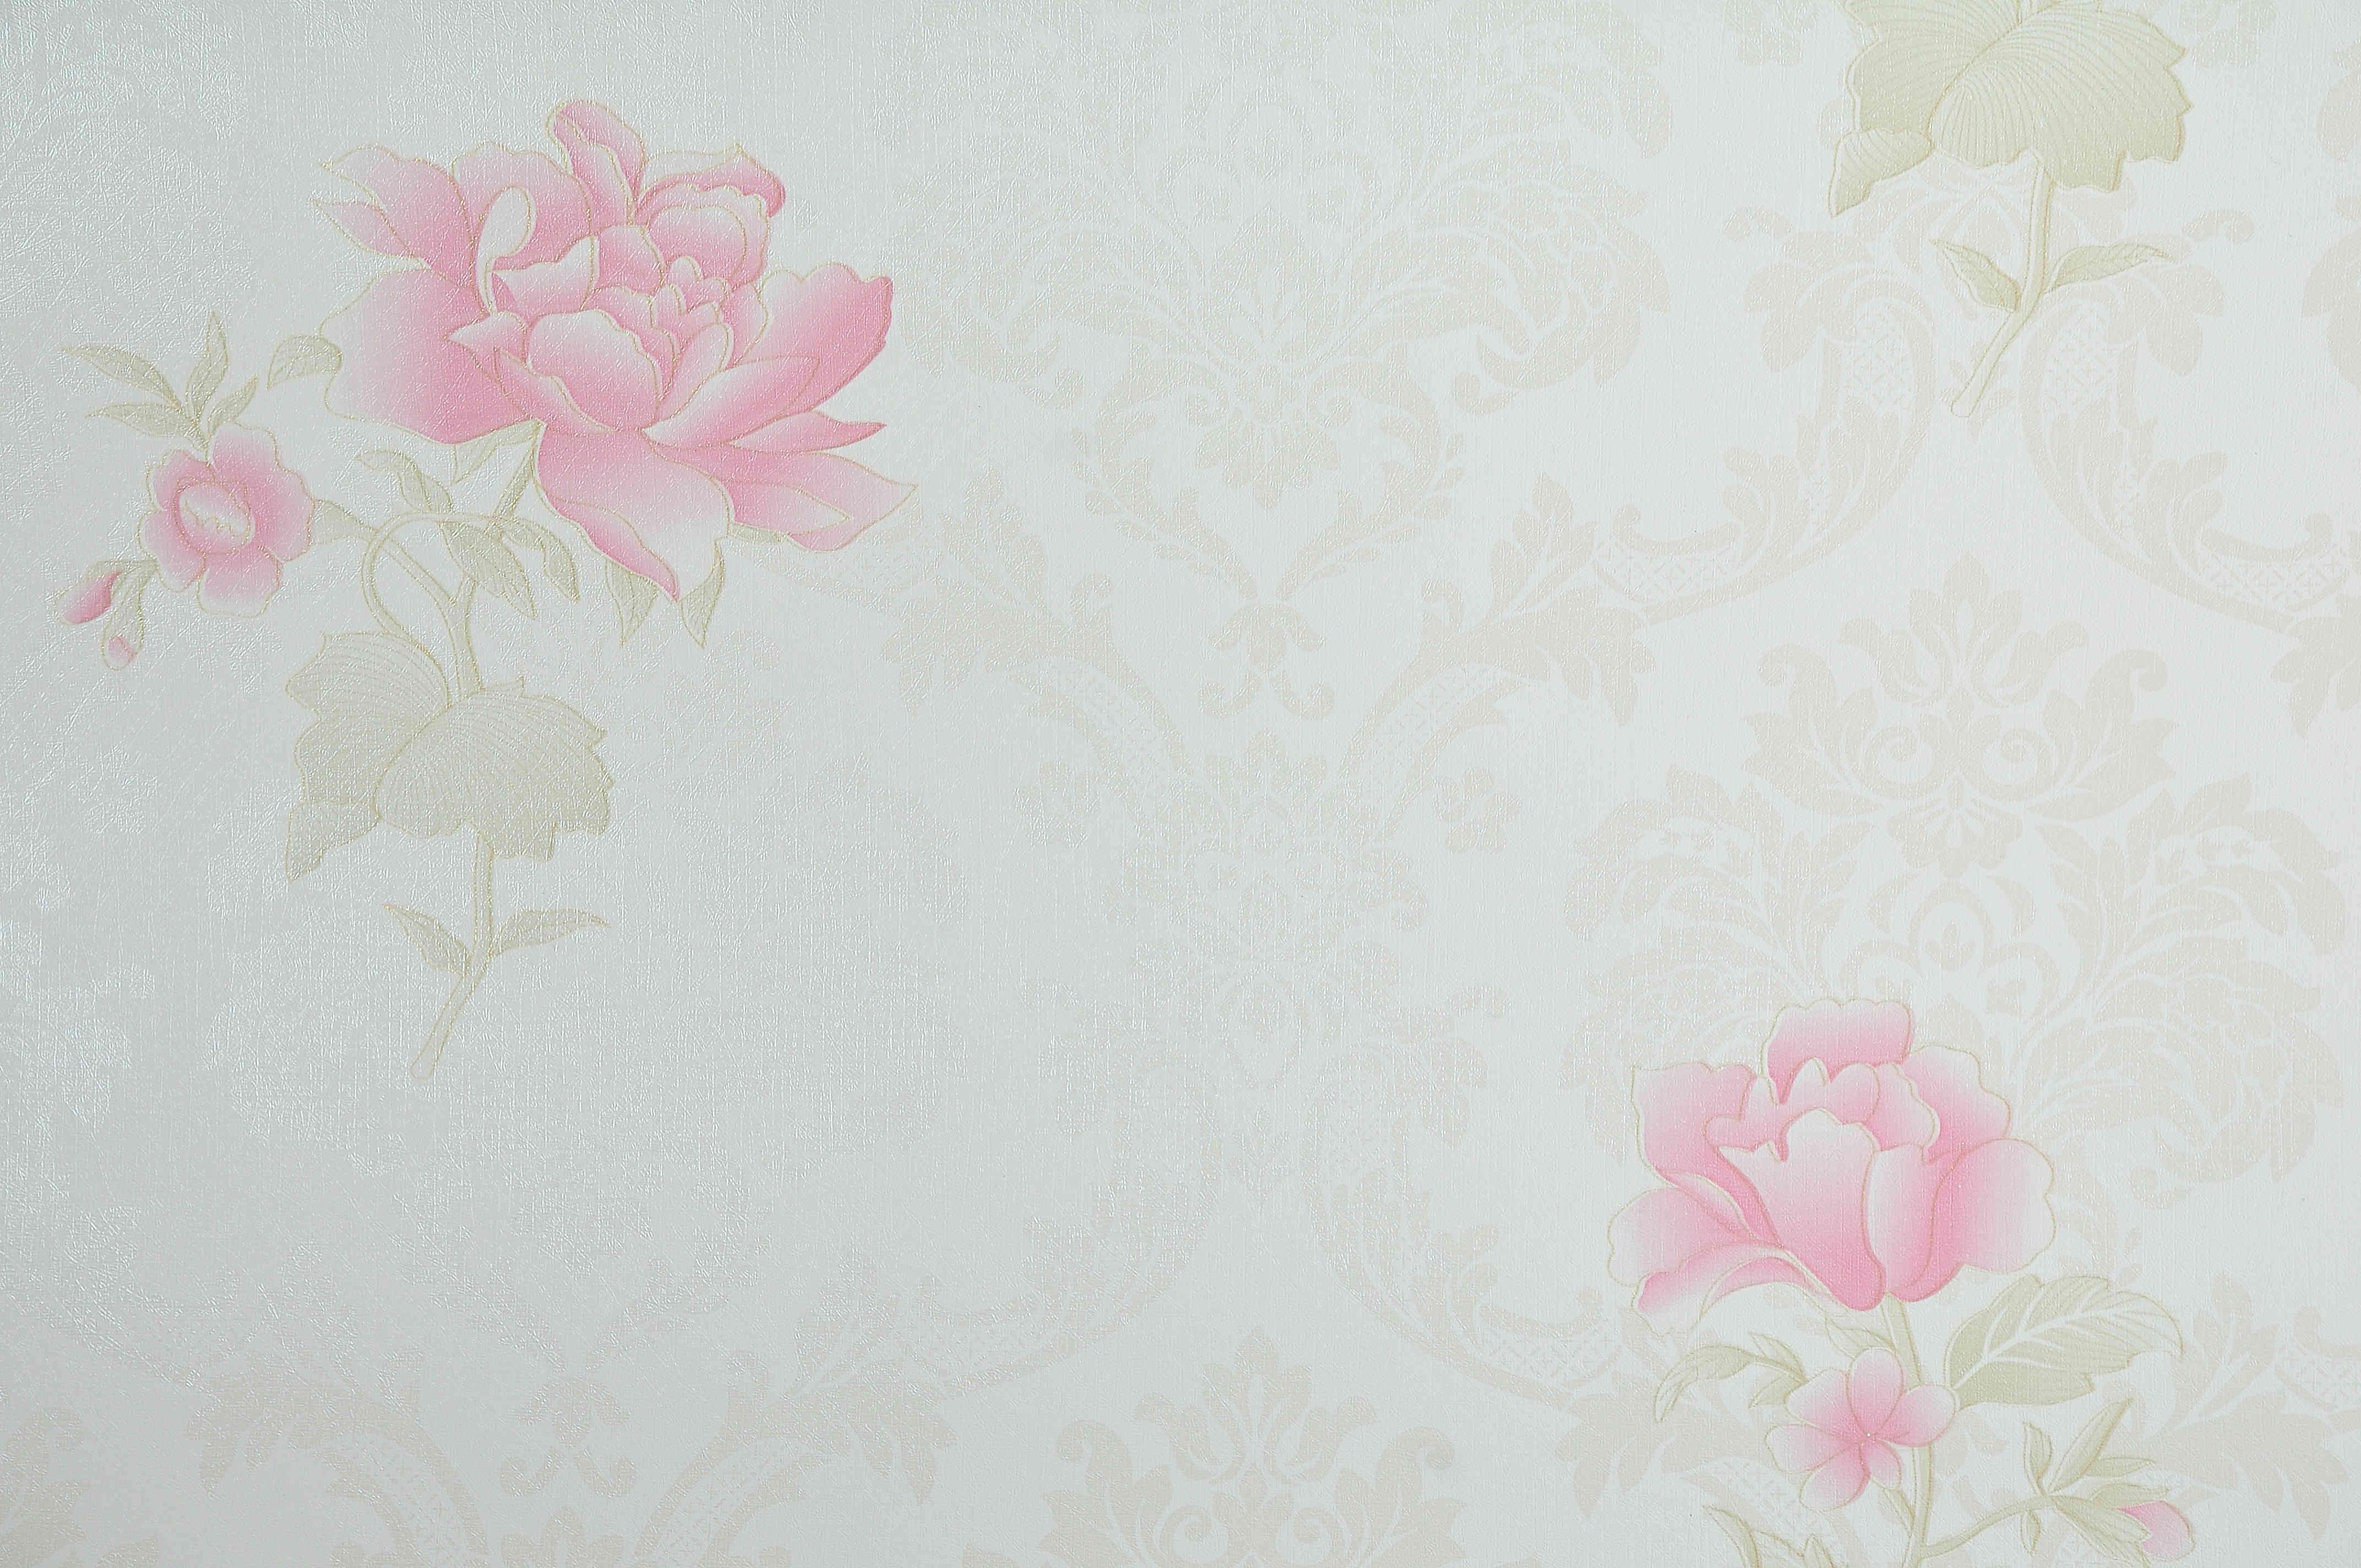 Wallpaper Stiker Motif Bunga Mawar 2